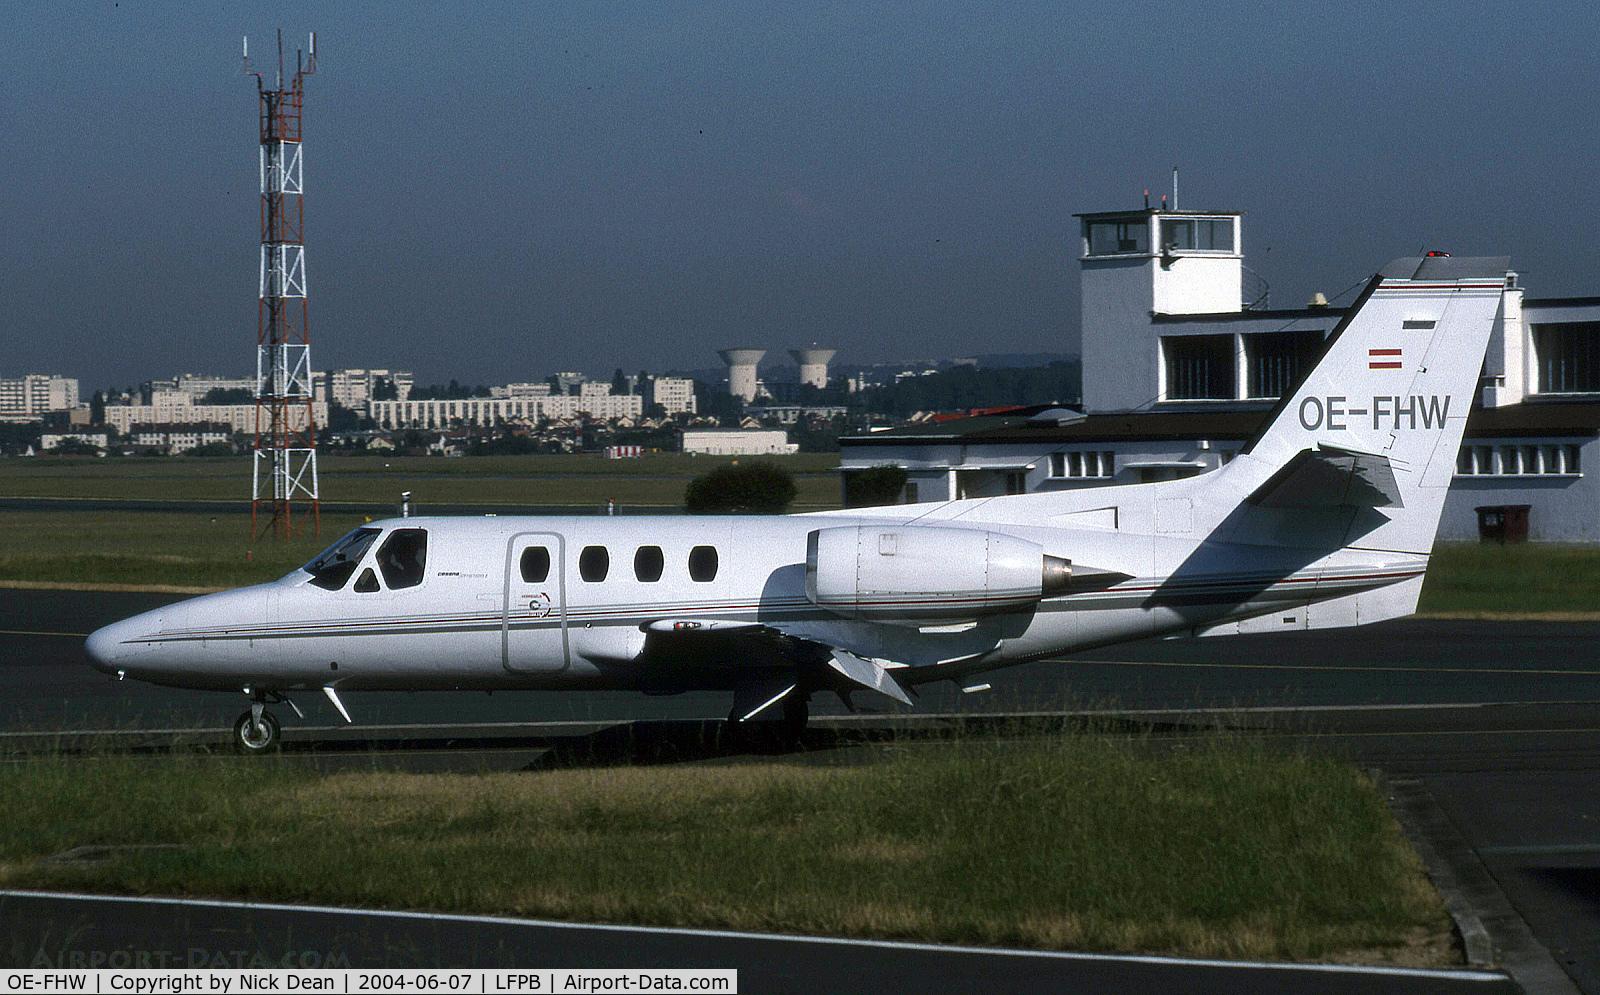 OE-FHW, 1979 Cessna 501 Citation I SP C/N 501-0121, LFPB